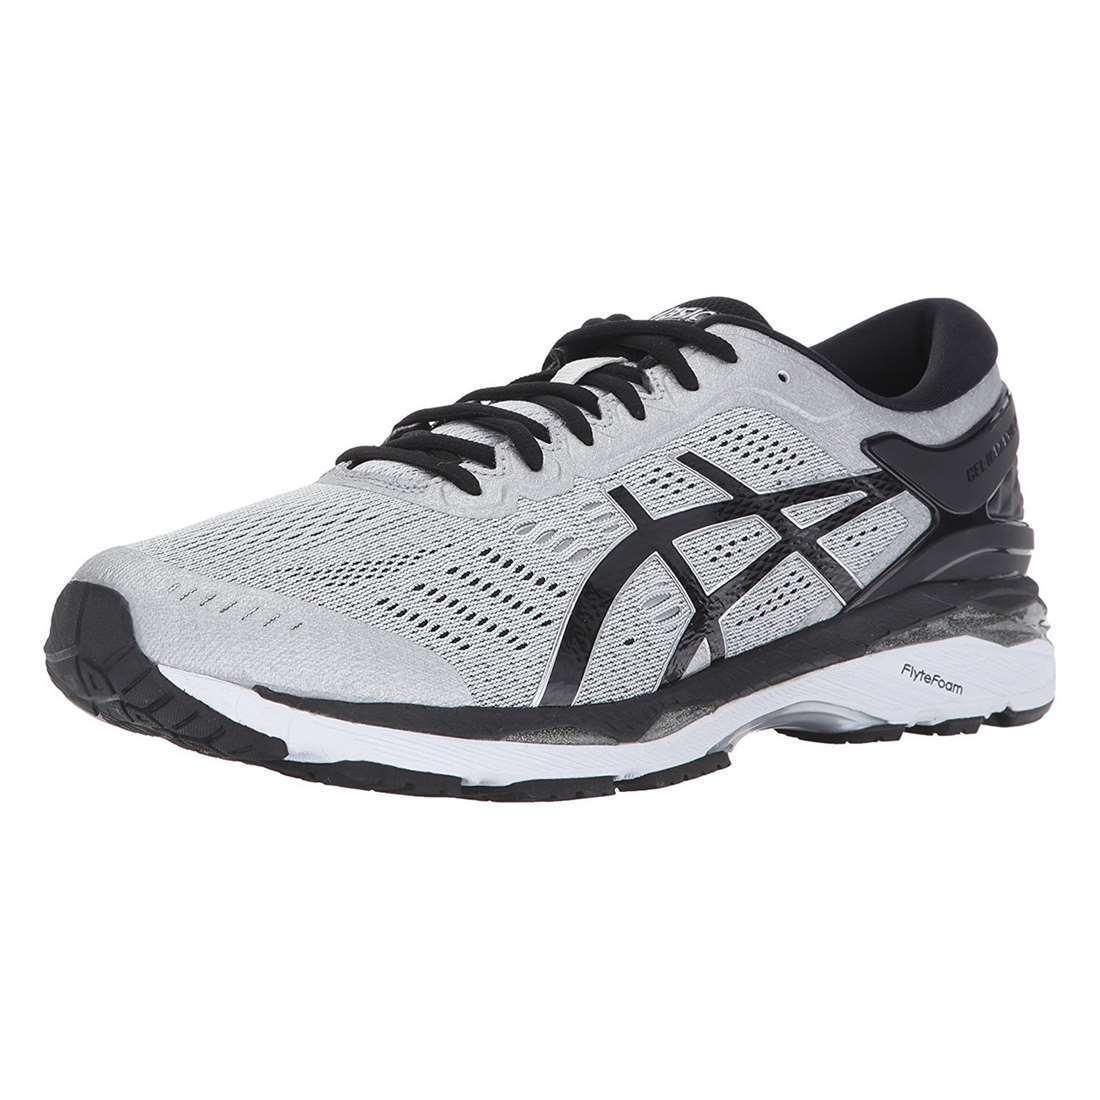 Asics Men's Men's Men's Gel-Kayano 24 Running shoes FlyteFoam FluidFit Runner Sneakers NEW 17c906